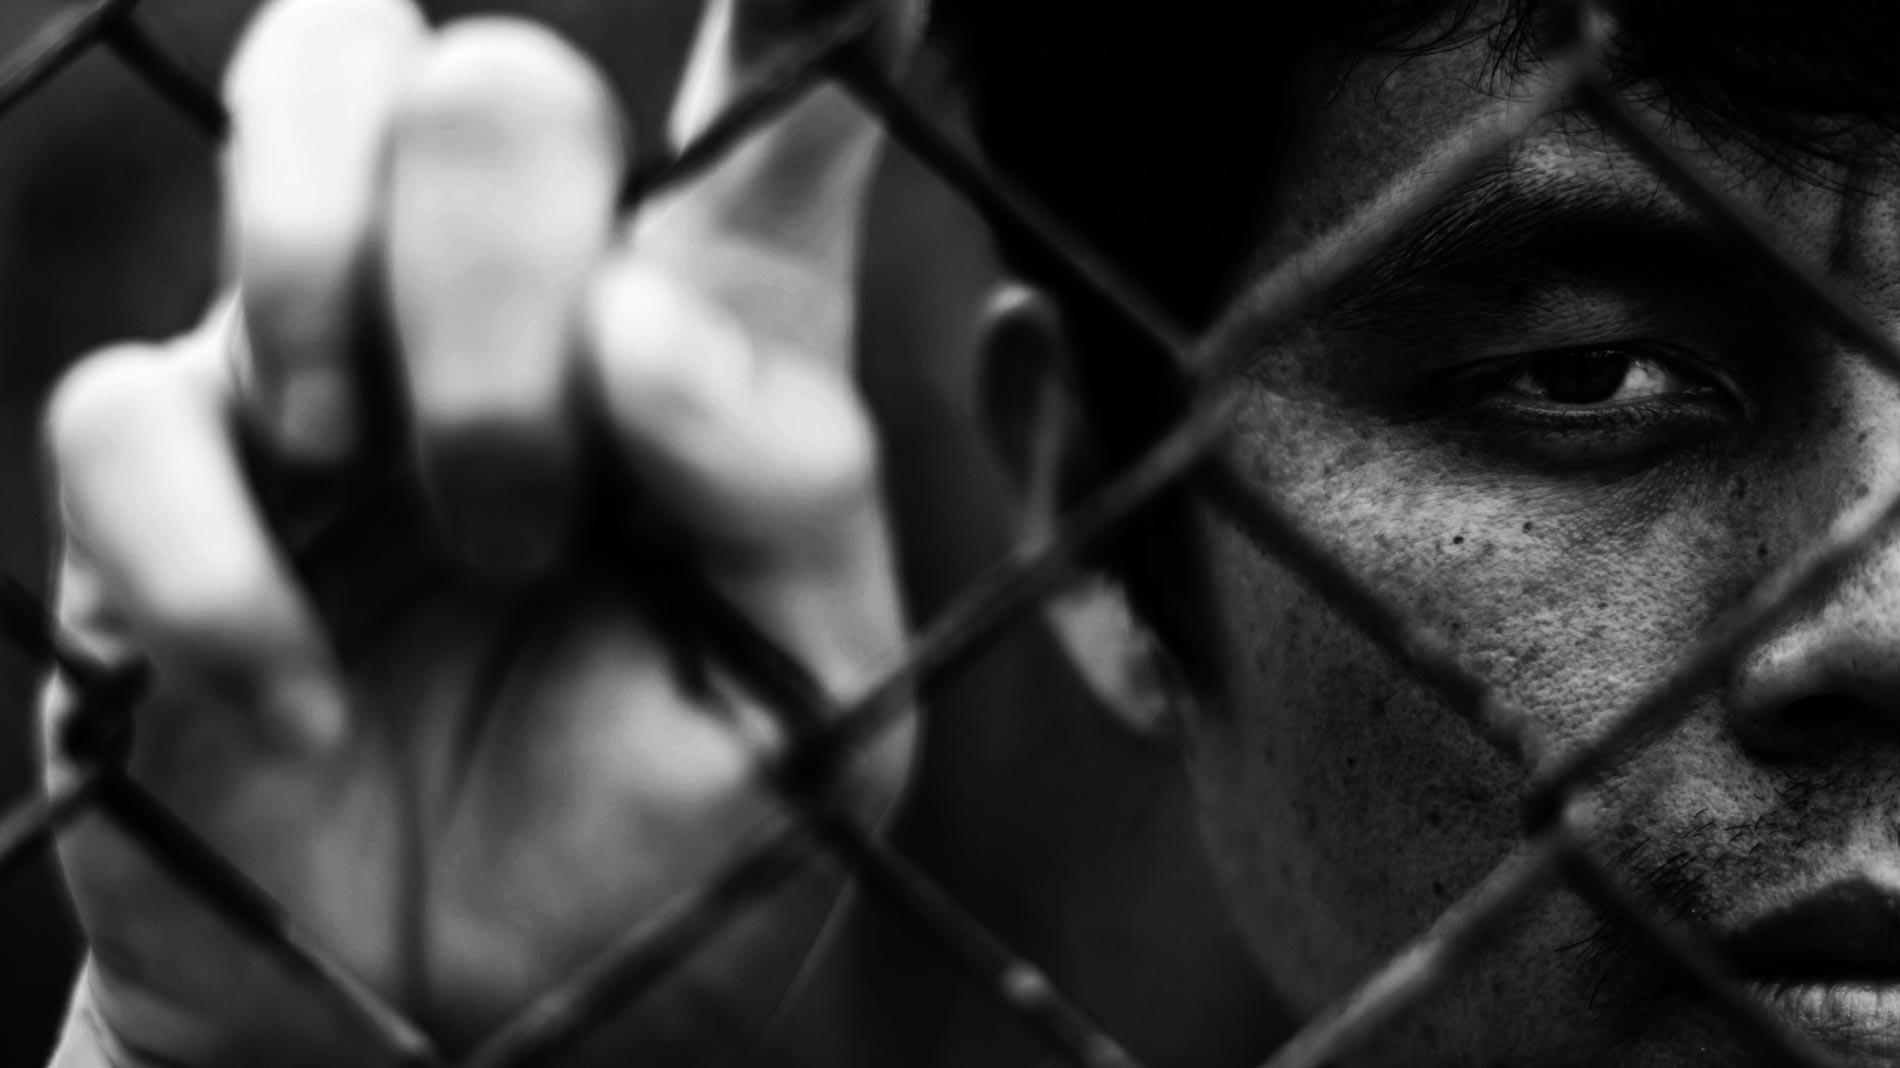 Denuncian subastas de esclavos subsaharianos en Libia